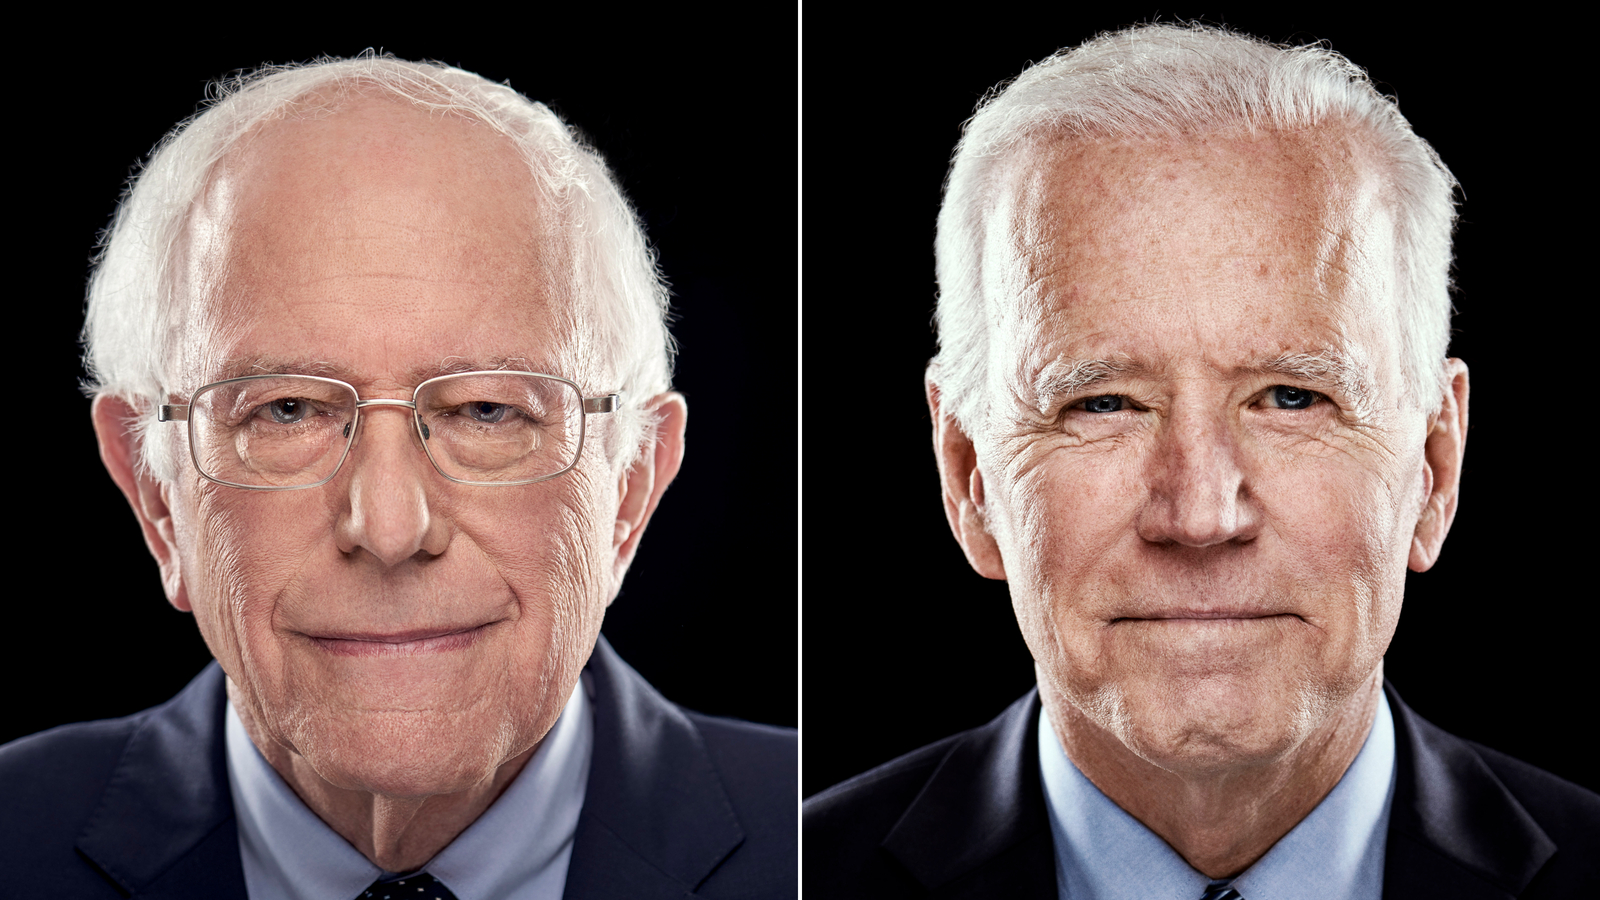 Poll: Biden and Sanders lead Democratic field in South Carolina